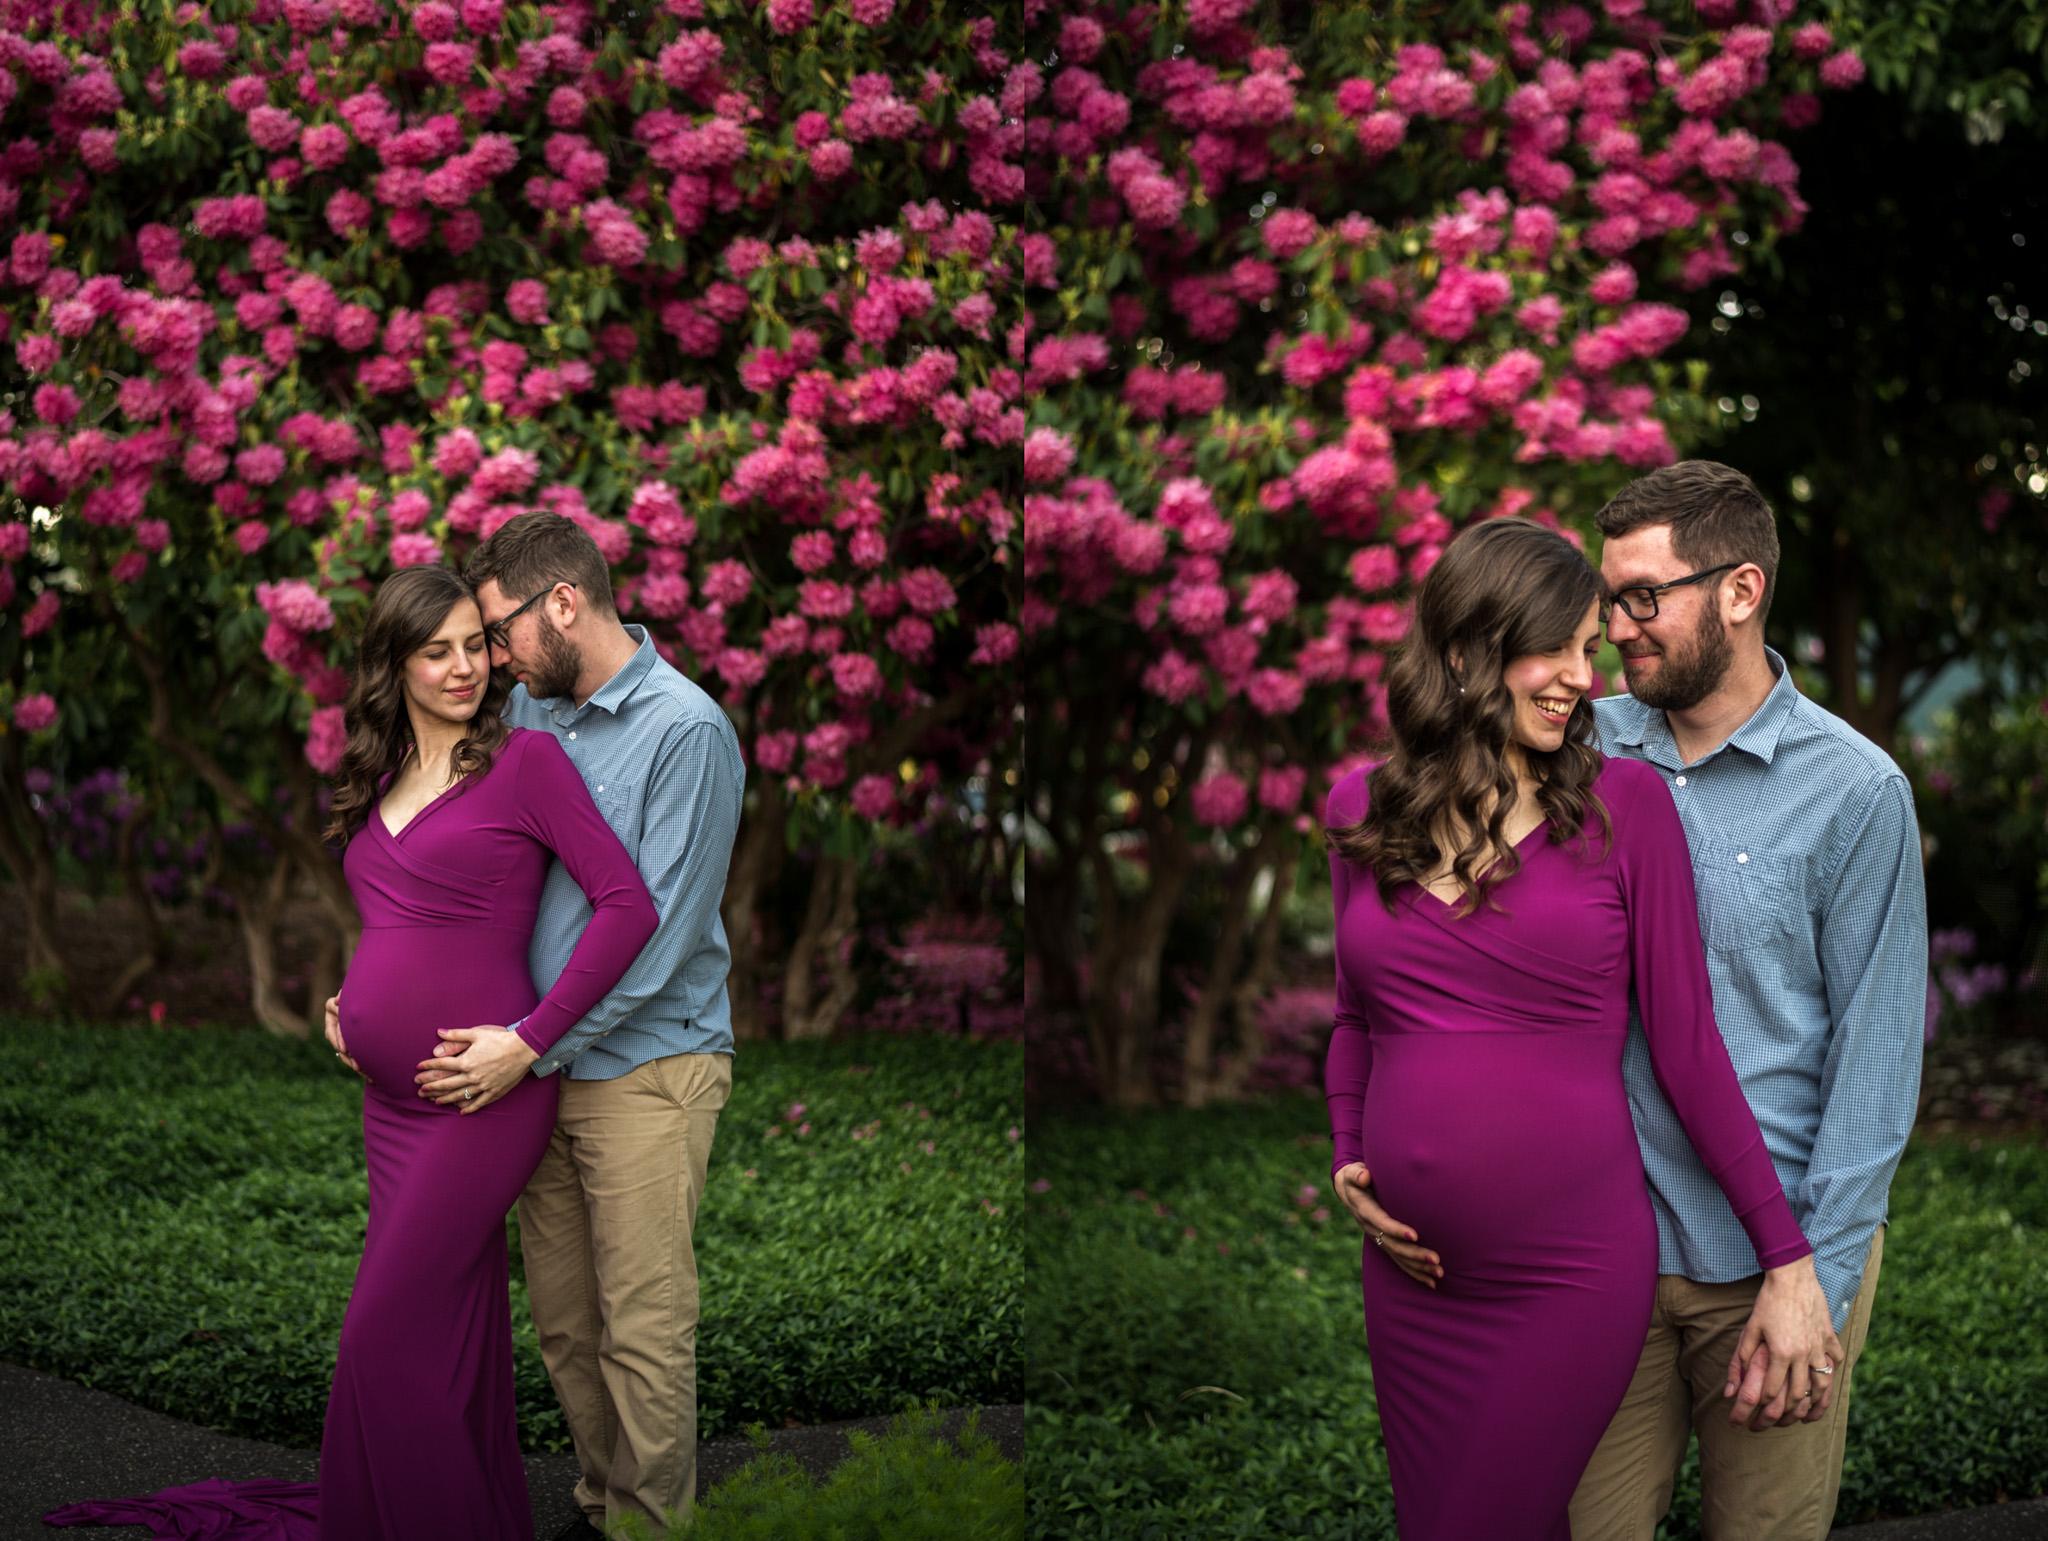 Deer Lake Park Maternity Photographer Collage-201.jpg